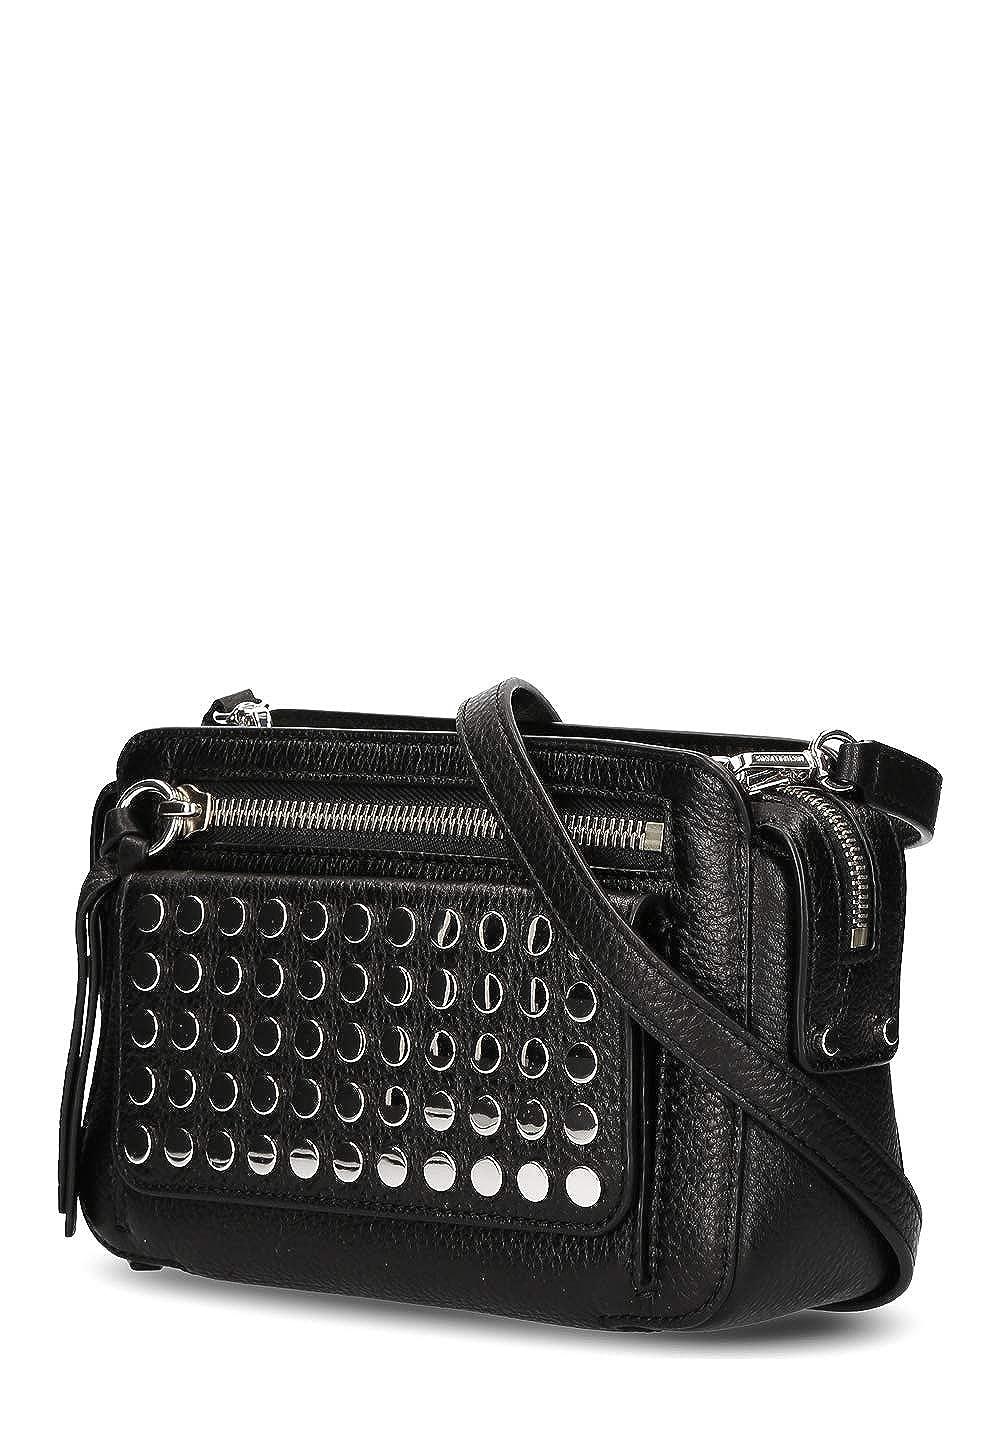 214875414c1 Michael Kors Damen Damen Umhänge Tasche Bag echt Leder Schulter: Amazon.de:  Bekleidung